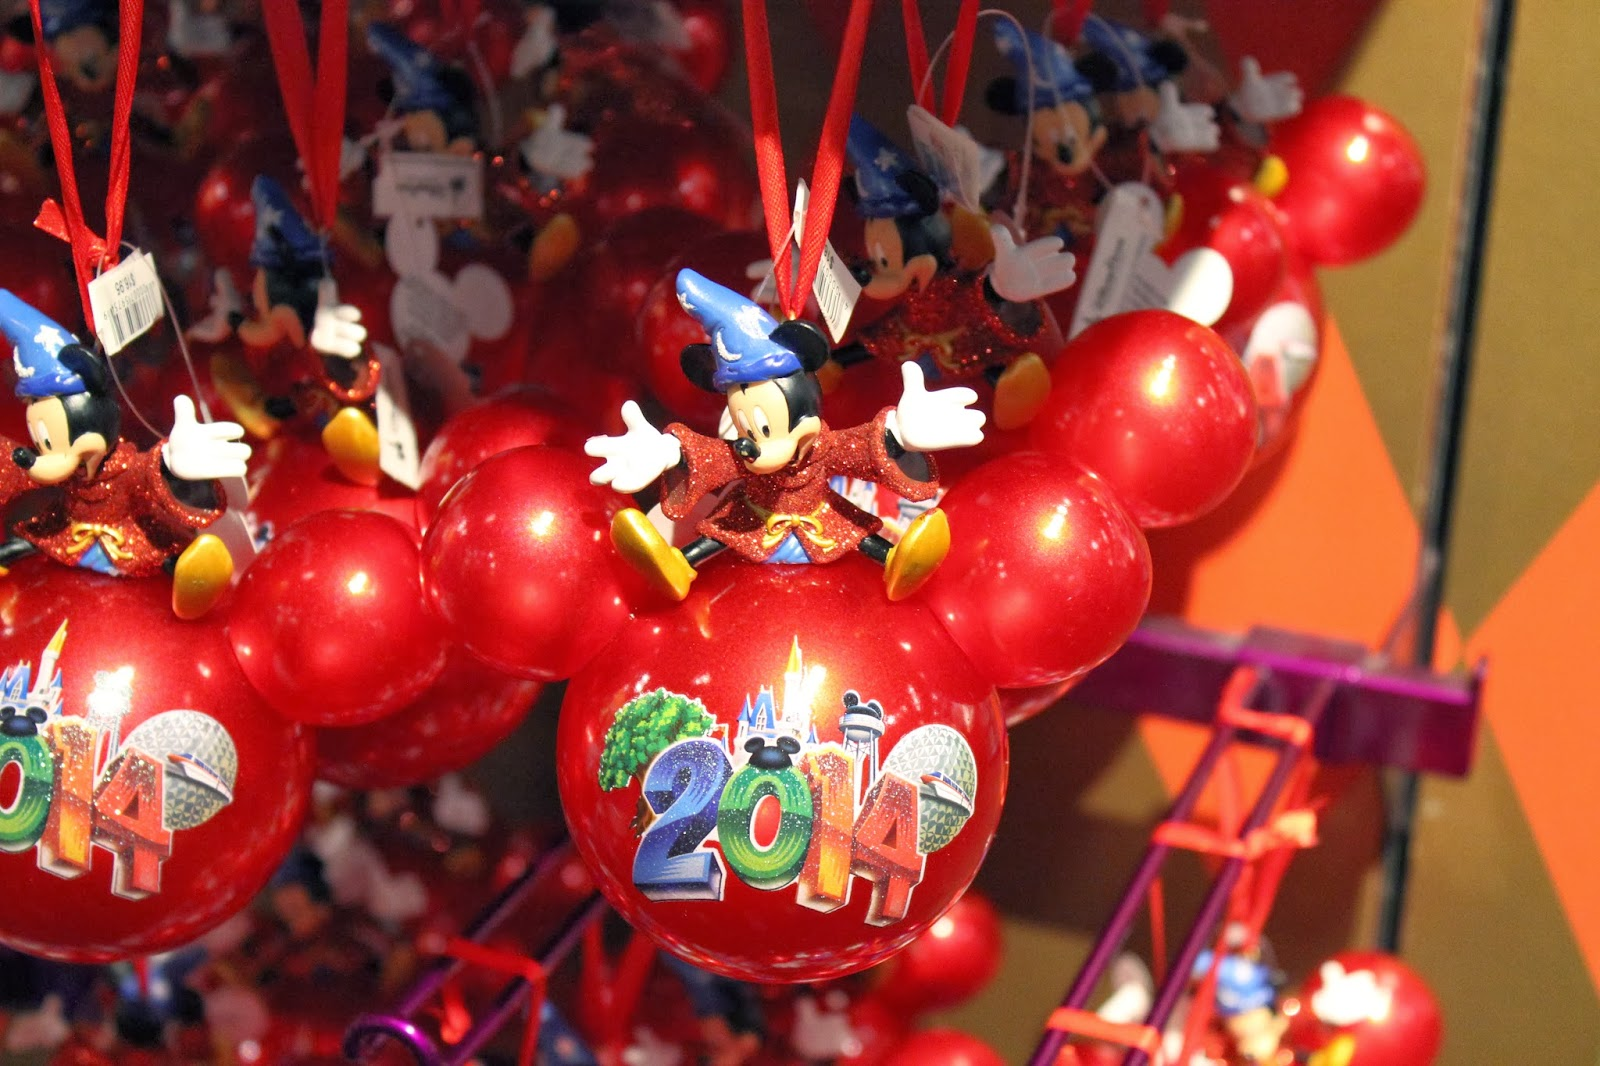 Disney world christmas decorations 2014 - 2014 Disney World Christmas Ornaments